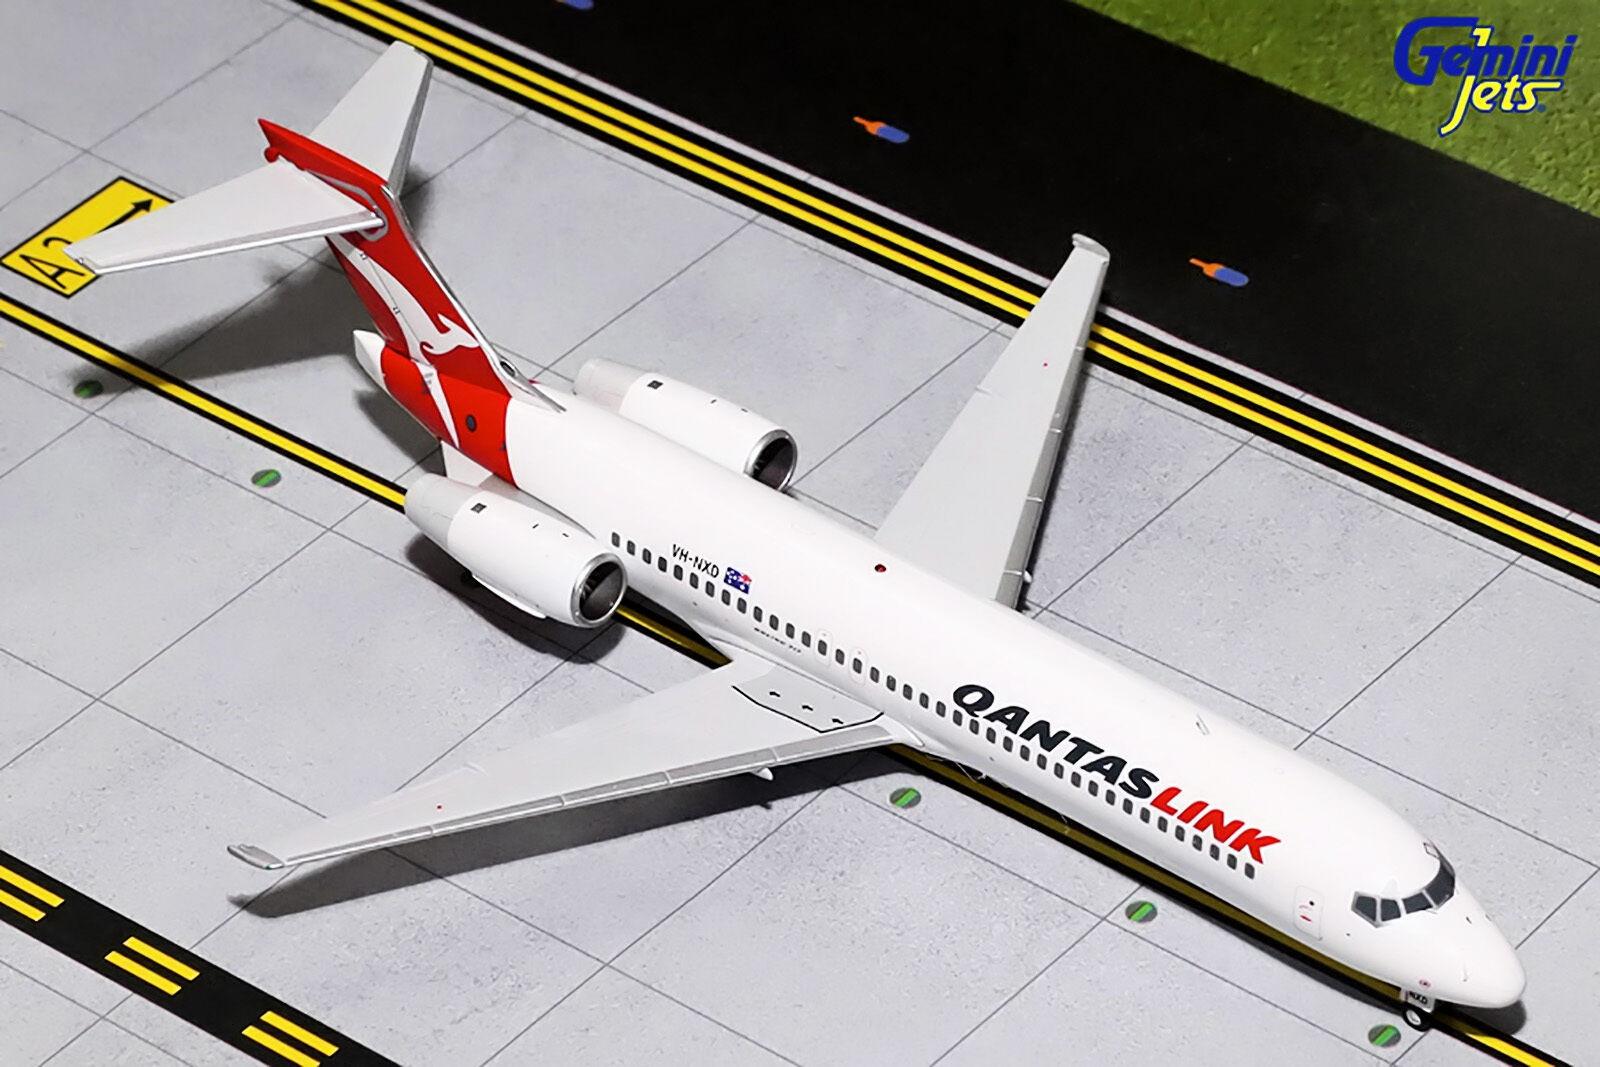 Gemini200 qantaslink (australien) boeing 717-200 g2qfa539 1   200, reg   vh-nxd.neue